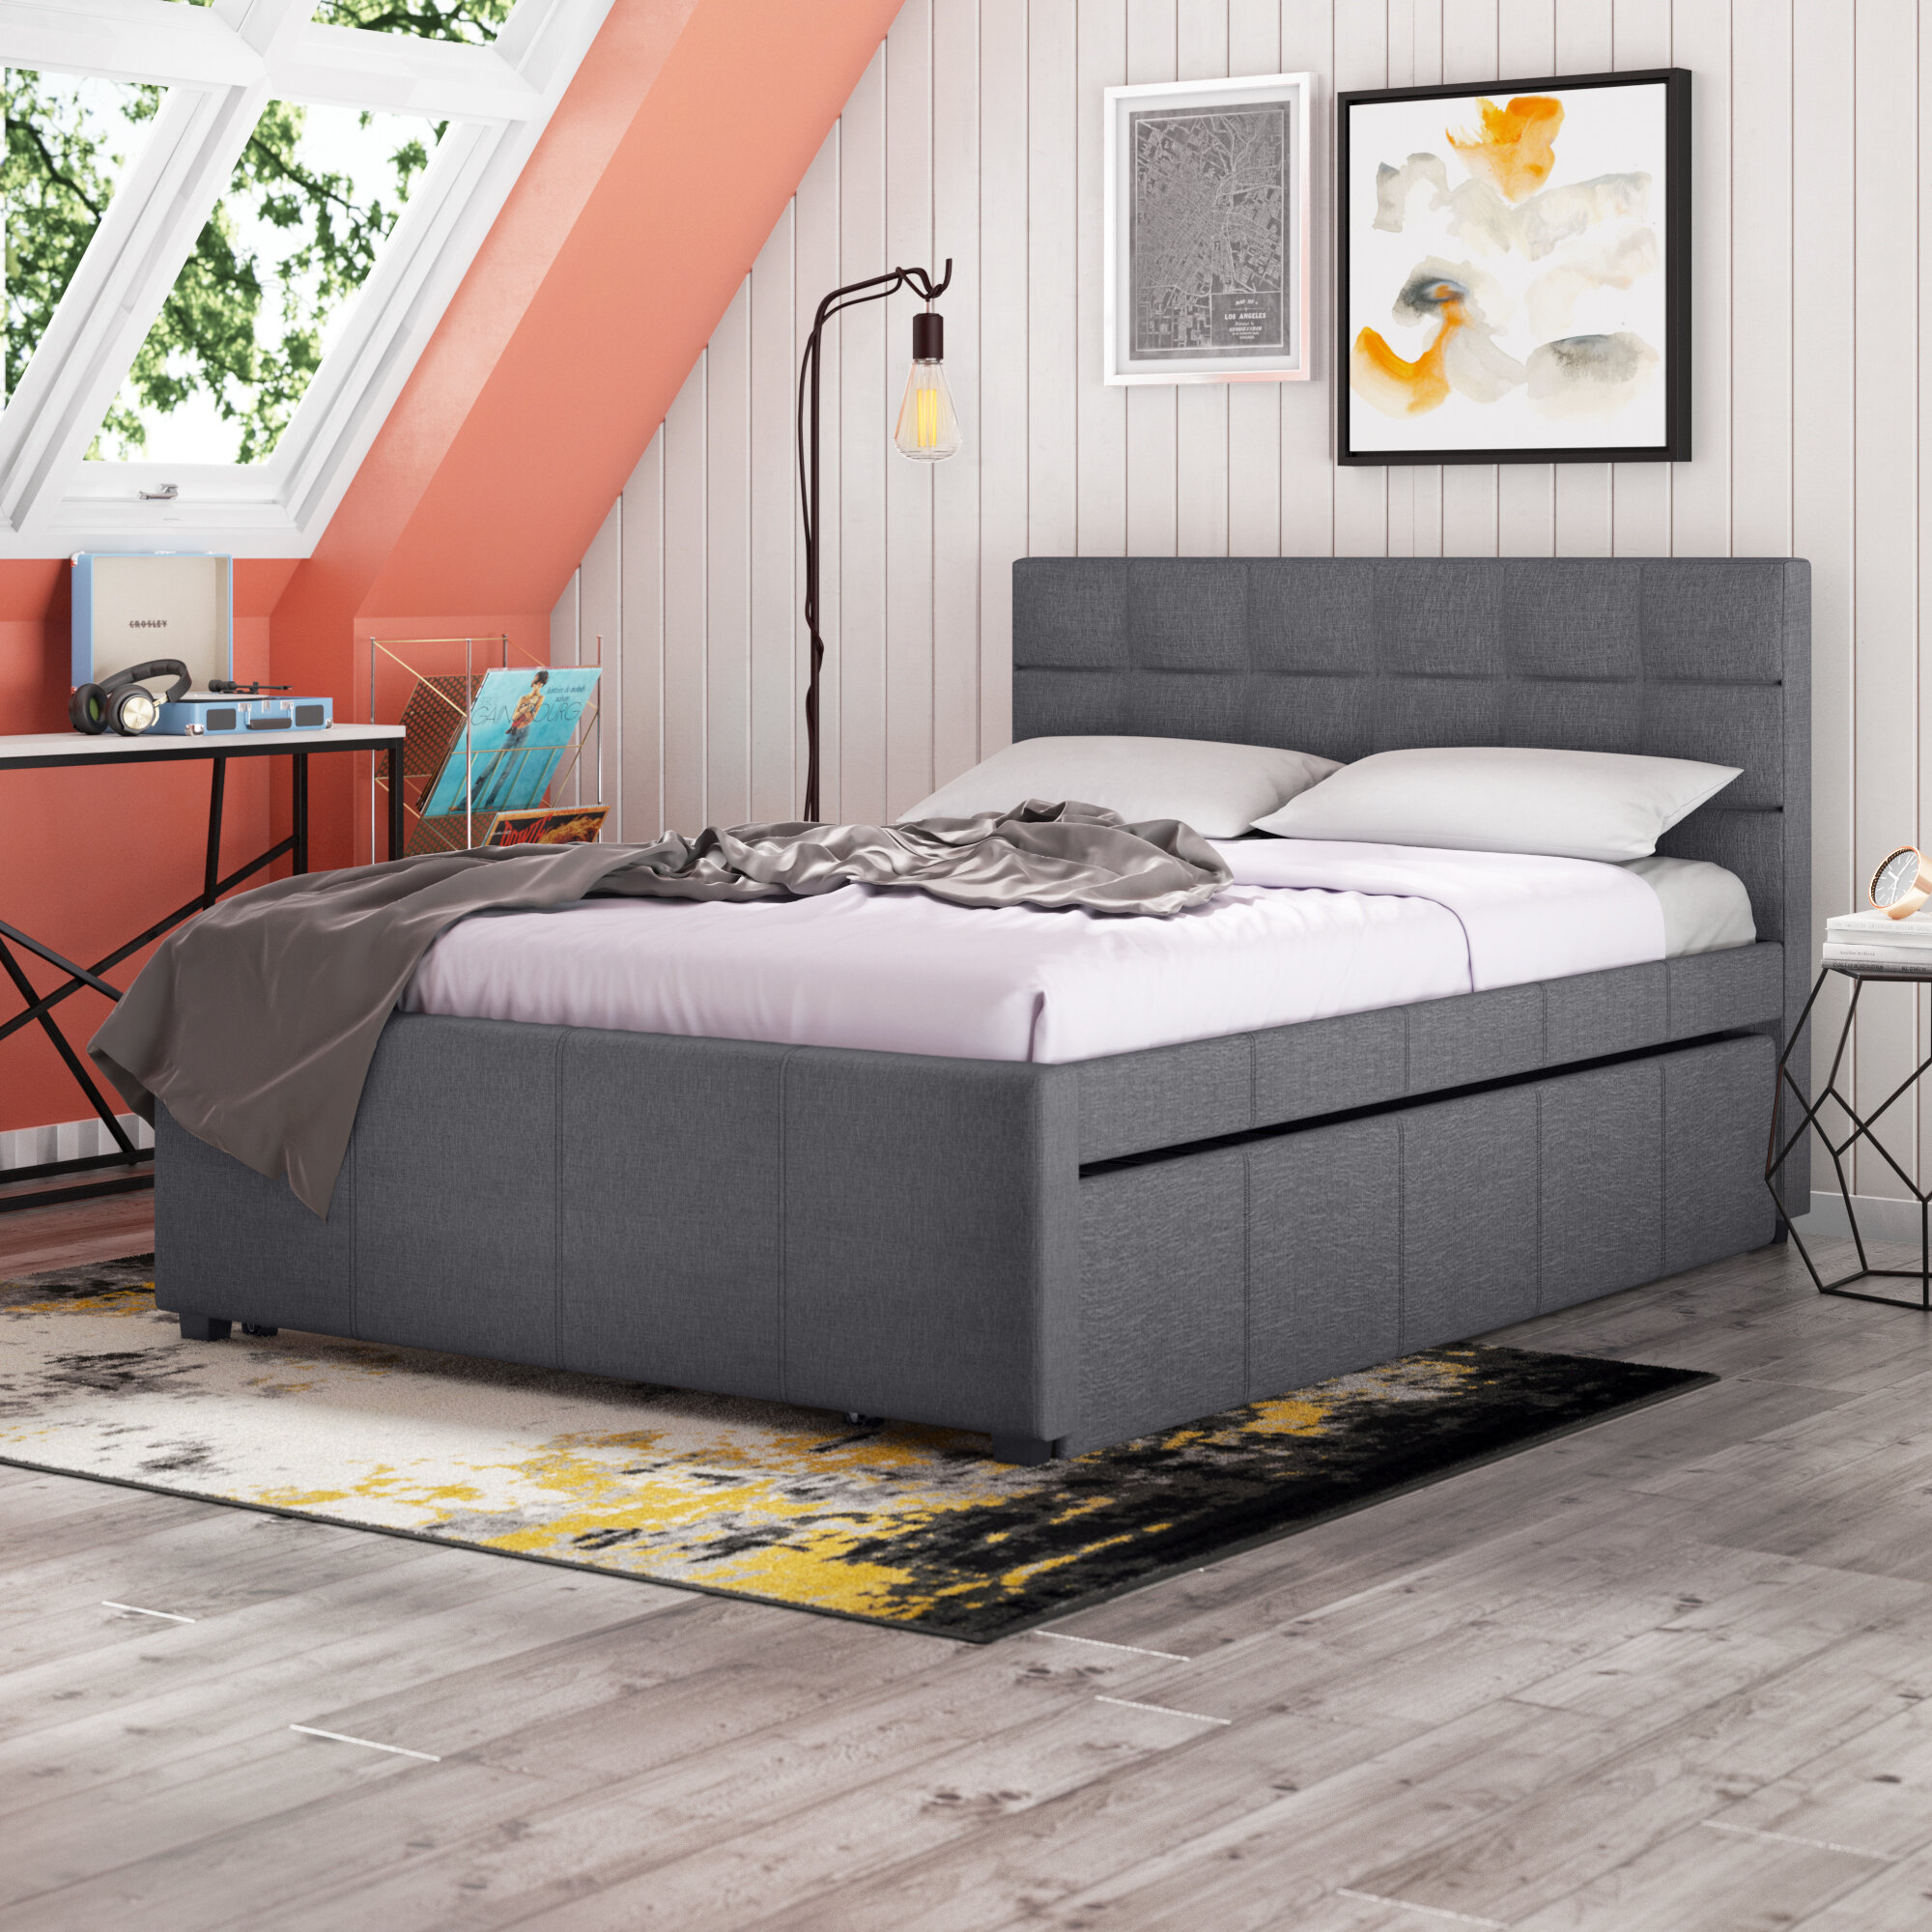 Brayden Studio Thornton Full Double Tufted Upholstered Platform Bed Reviews Wayfair